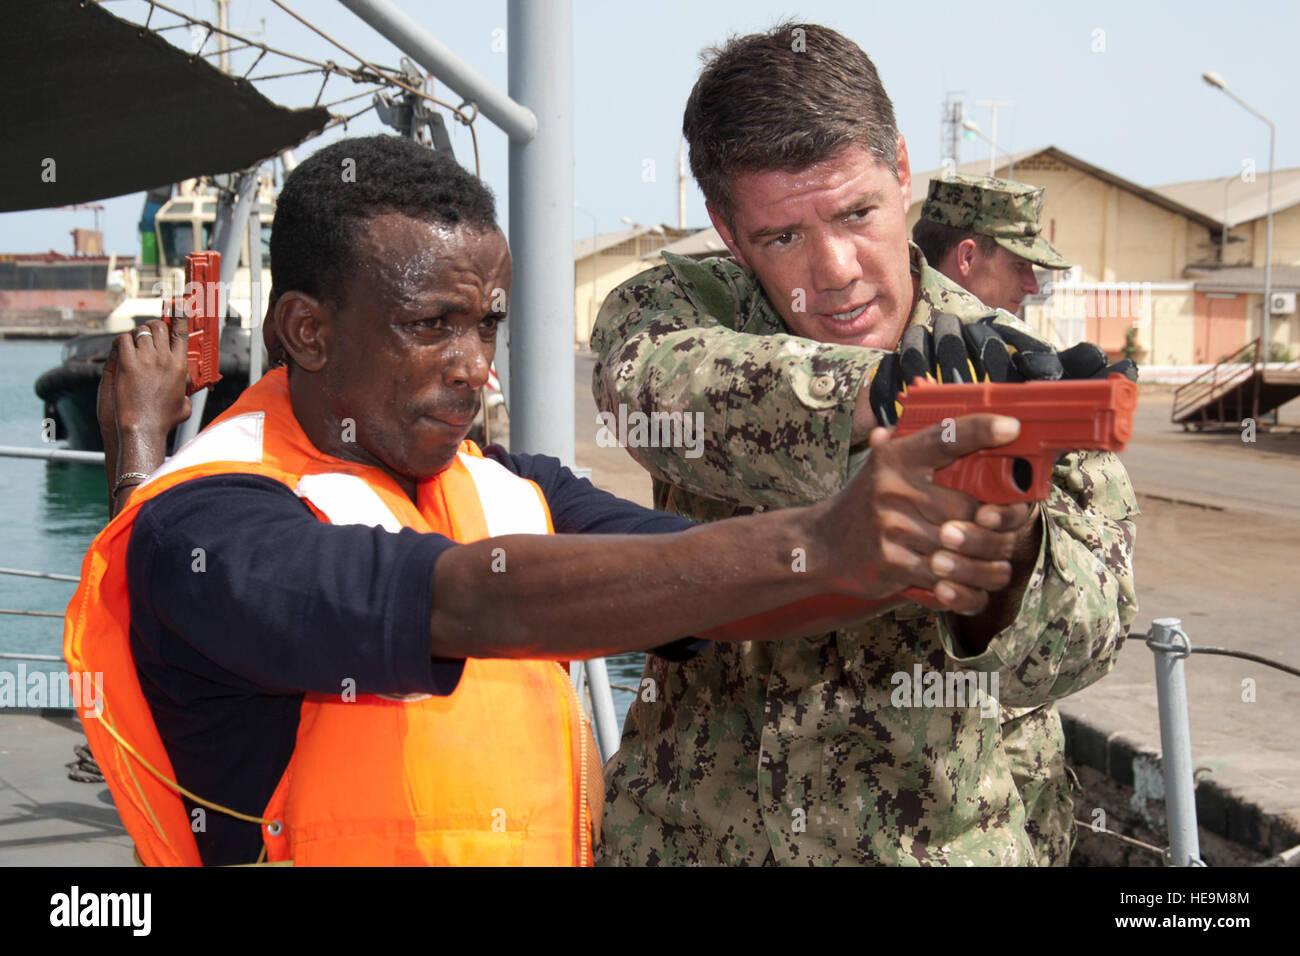 PPORT OF DJIBOUTI, Djibouti (May 28, 2012) – U.S. Navy Petty Officer 1st Class Anthony Nekervis (right), Maritime Stock Photo